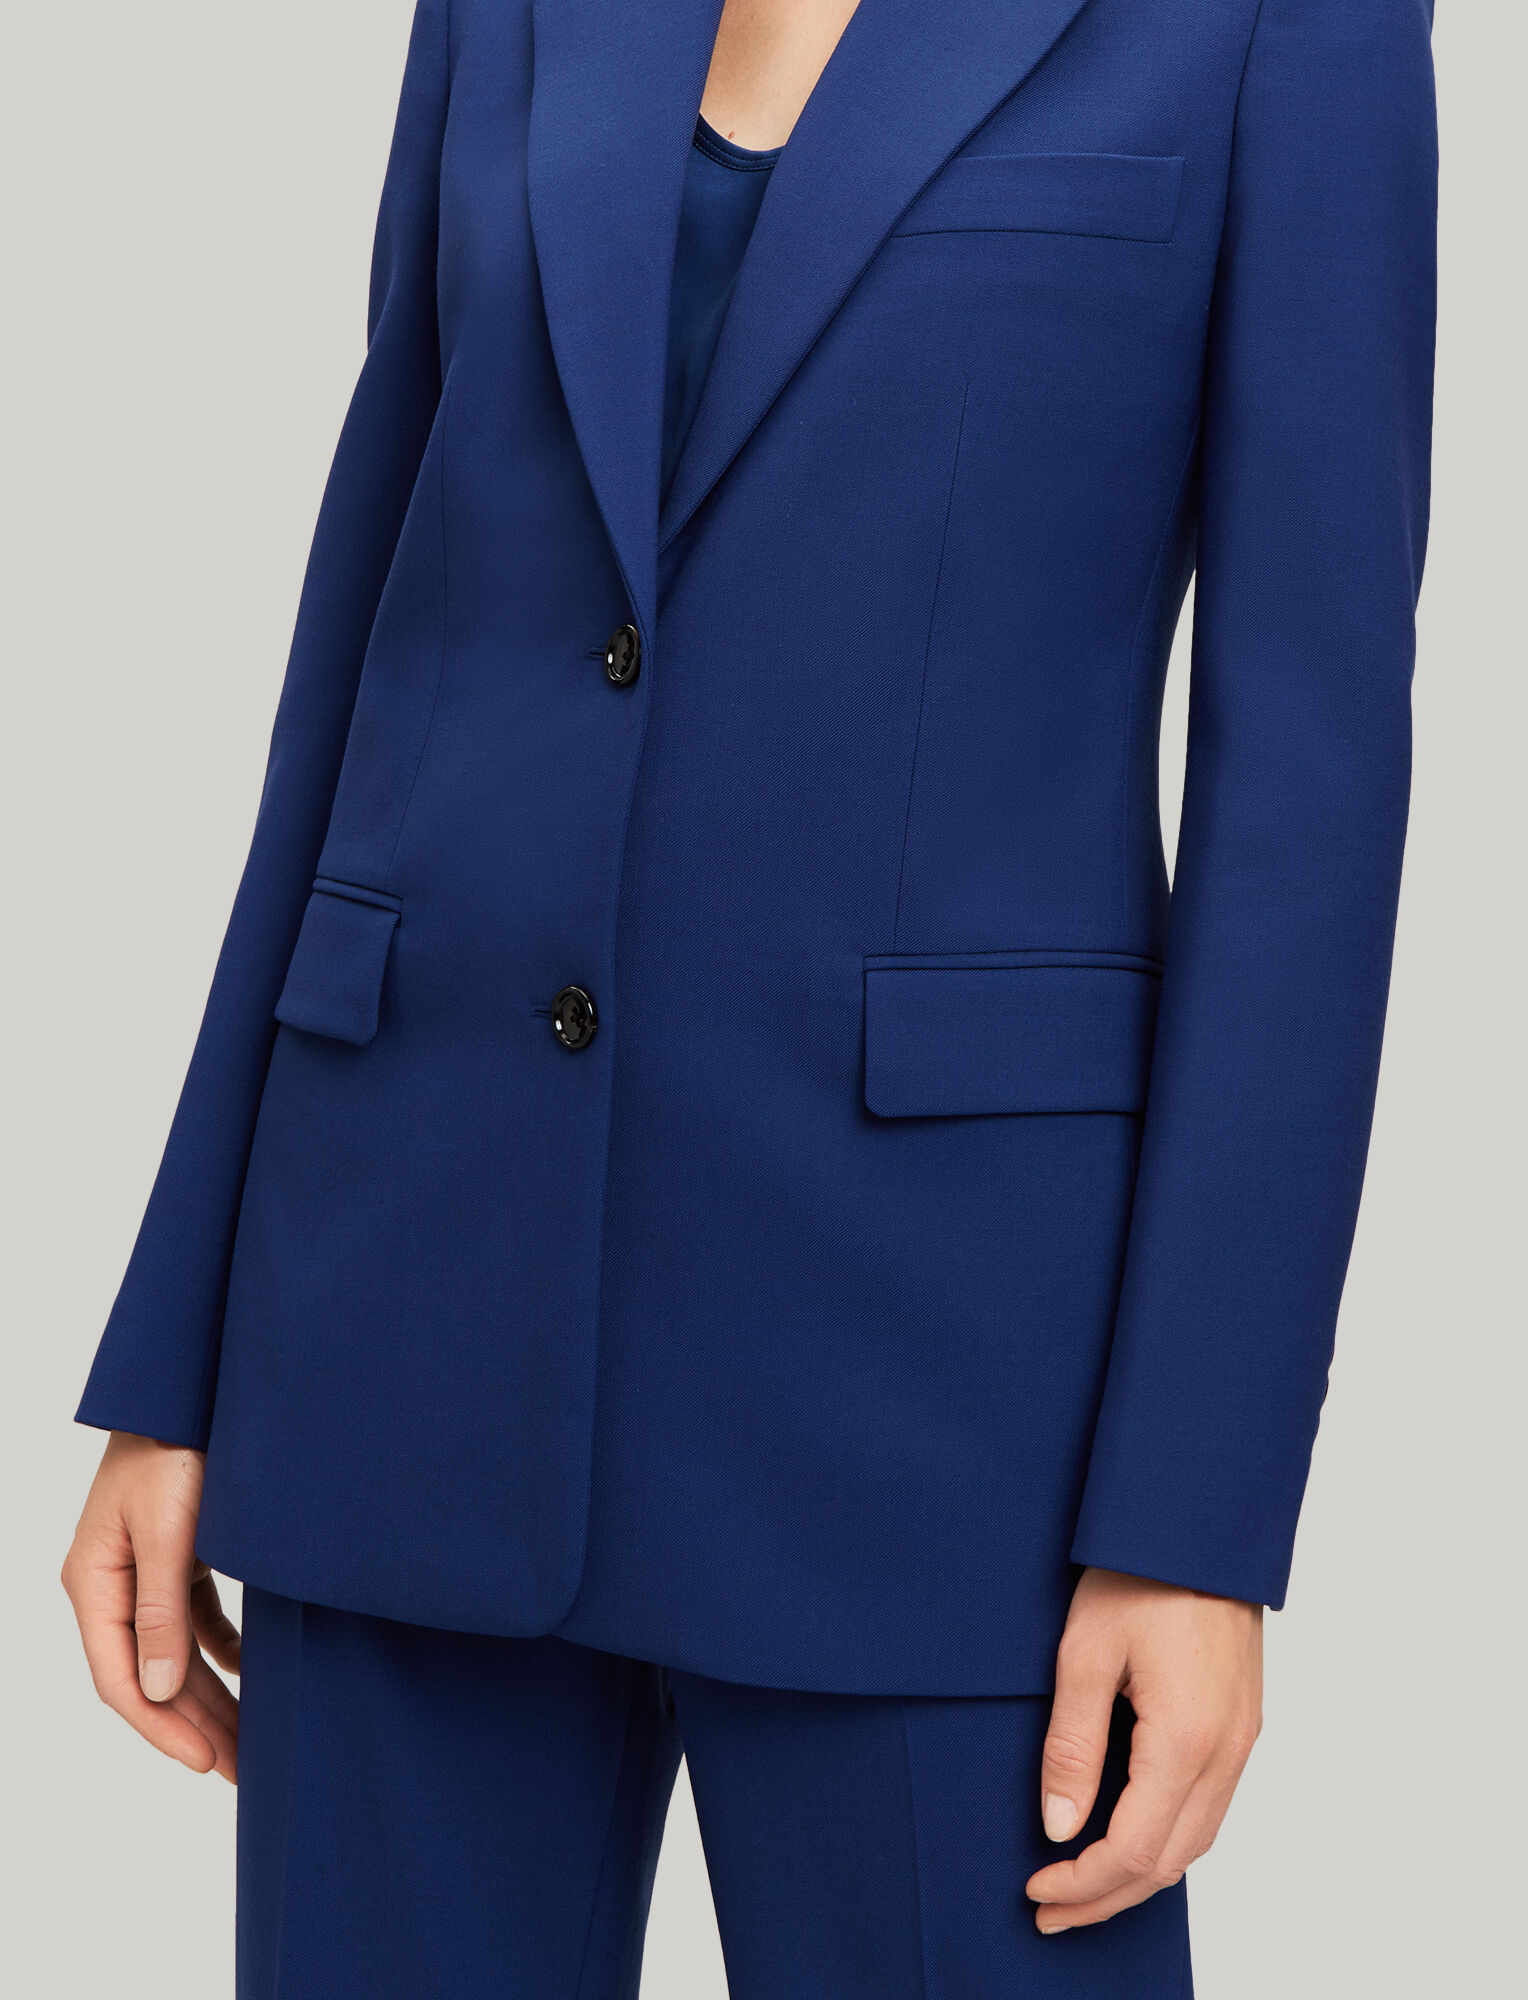 Joseph, New Lorenzo Comfort Wool Jacket, in INDIGO